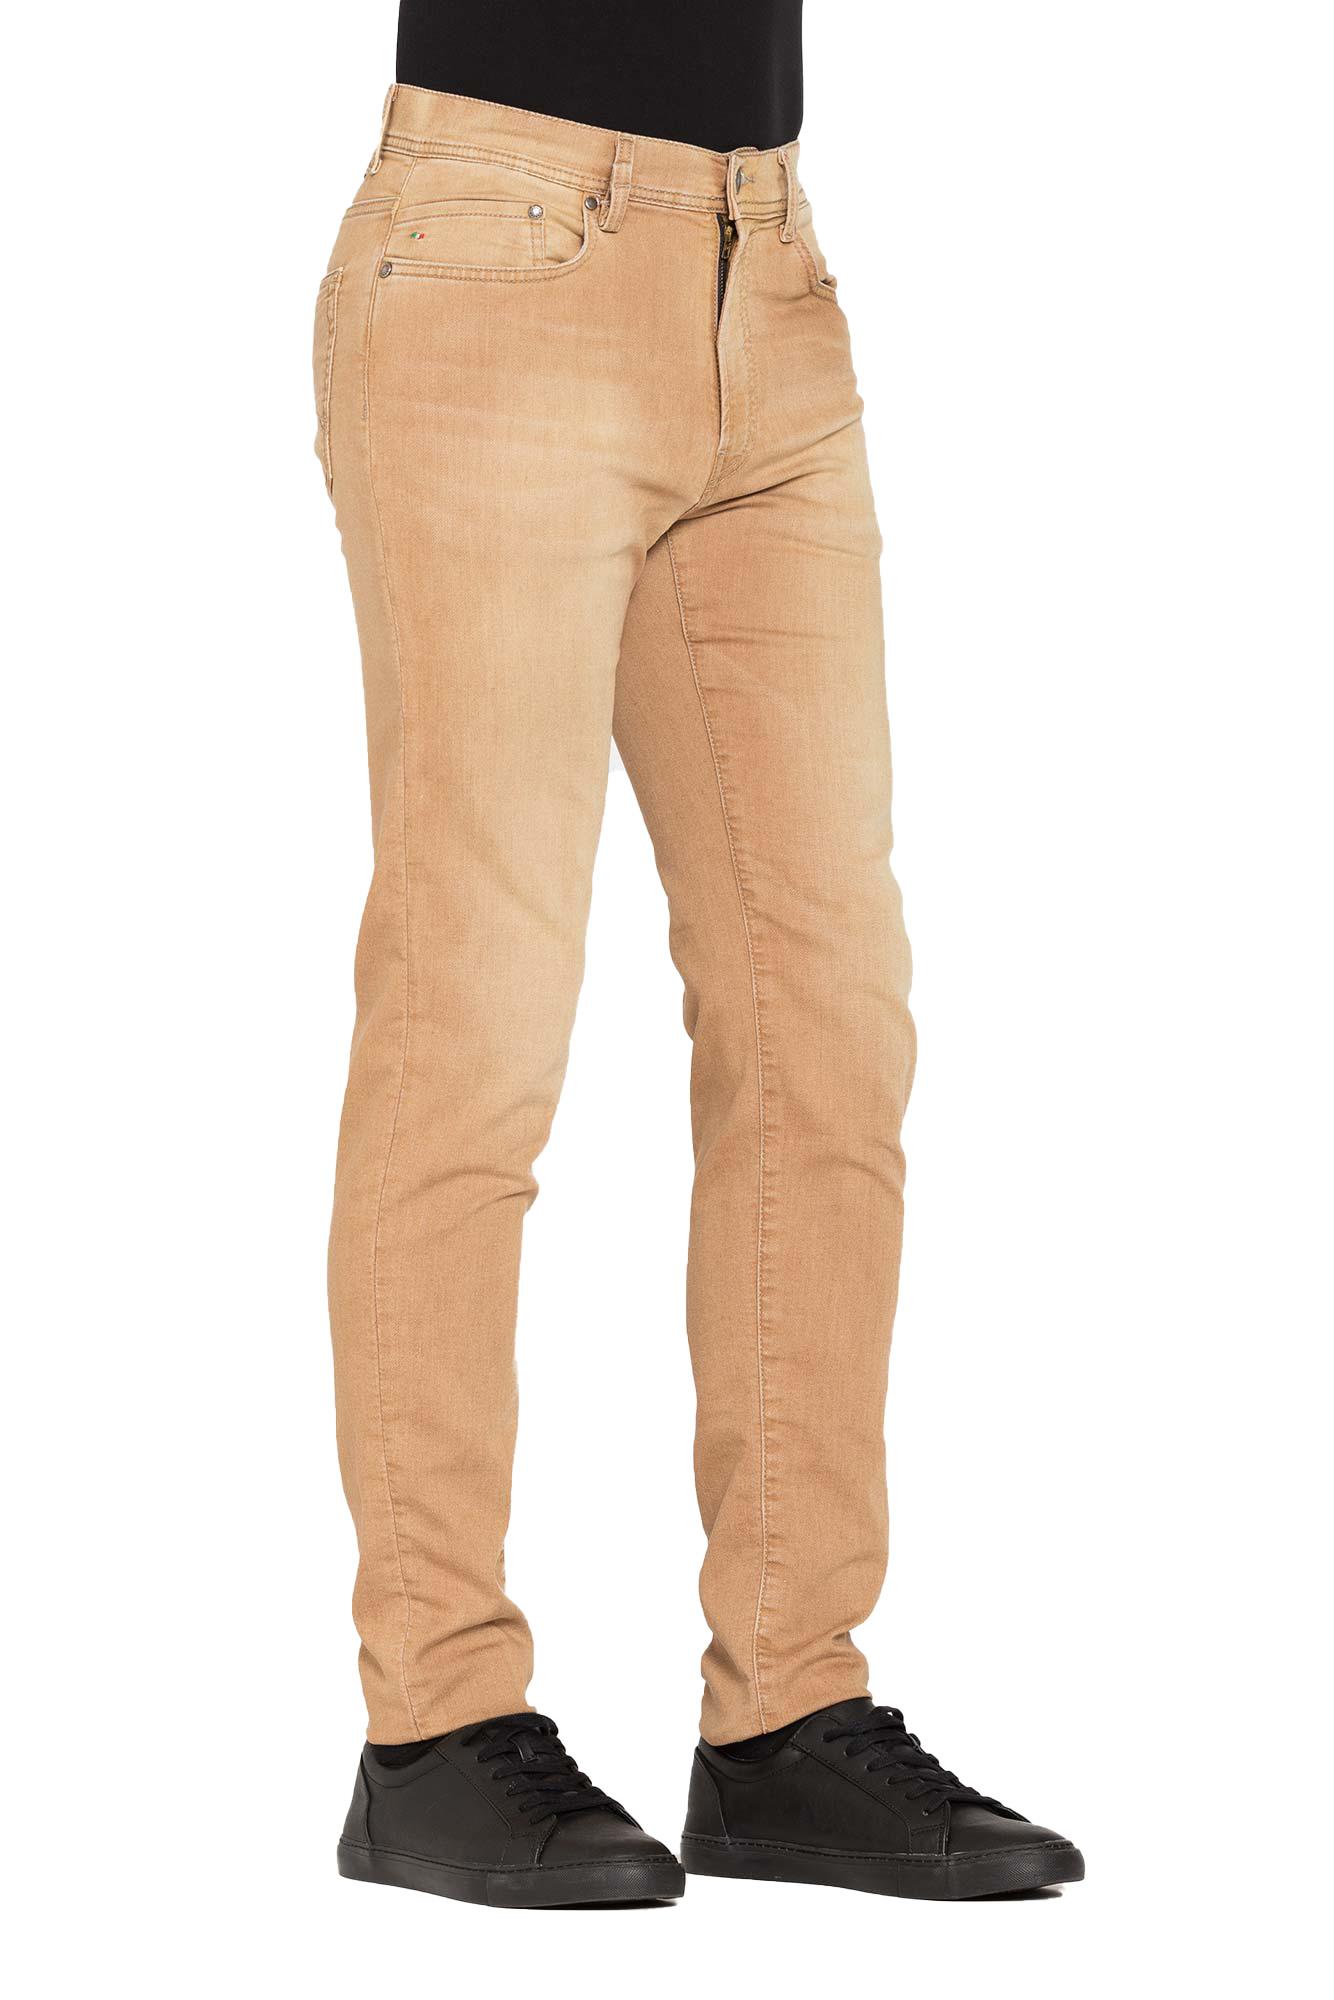 Carrera-Jeans-Jeans-per-uomo-tinta-unita miniatura 3